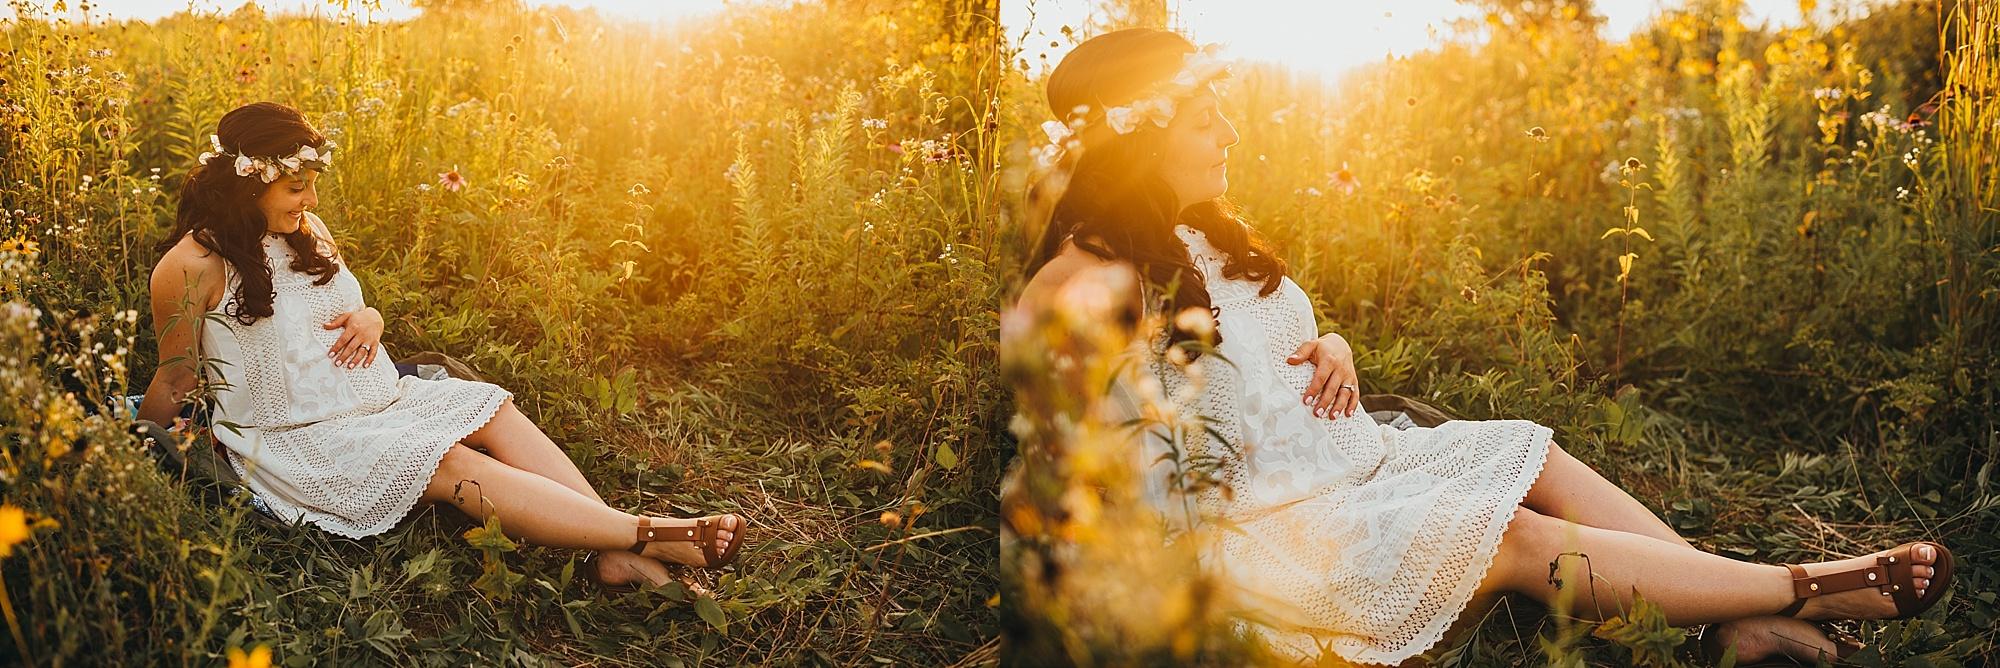 lauren-grayson-photography-cleveland-ohio-photographer-maternity-summer-outdoor-bohemian-fields-session_0496.jpg